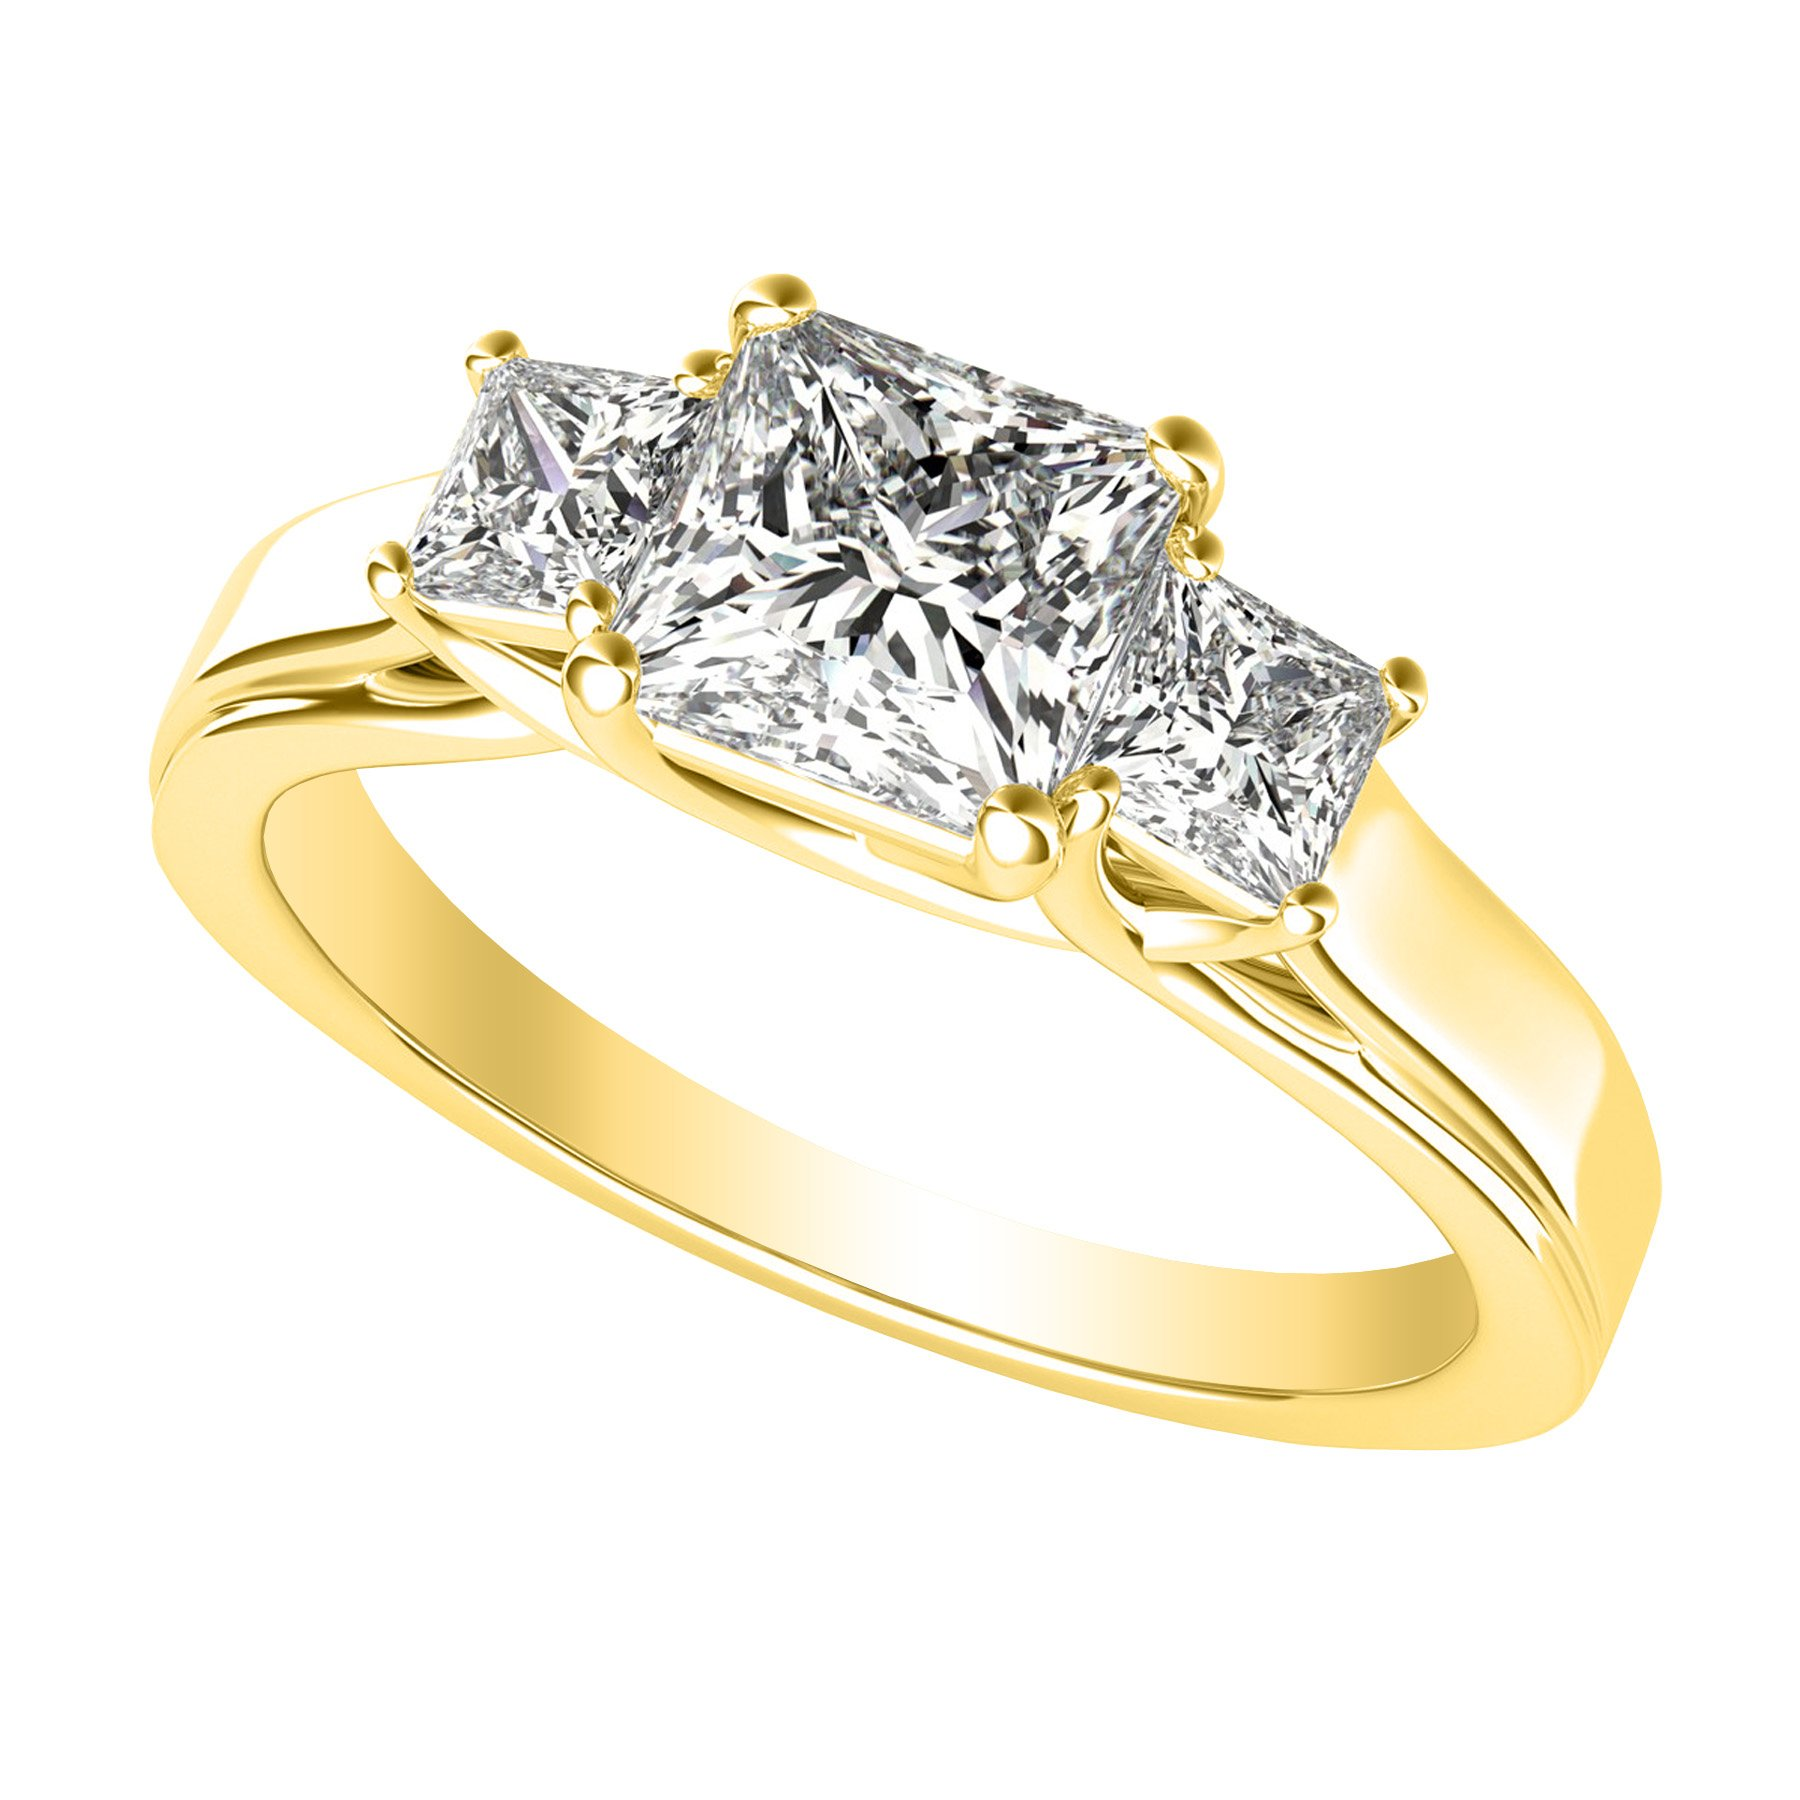 3/4 Carat 3 Three Stone Princess Diamond Engagement Ring 14K Yellow Gold I-J Color I1-I2 Clarity